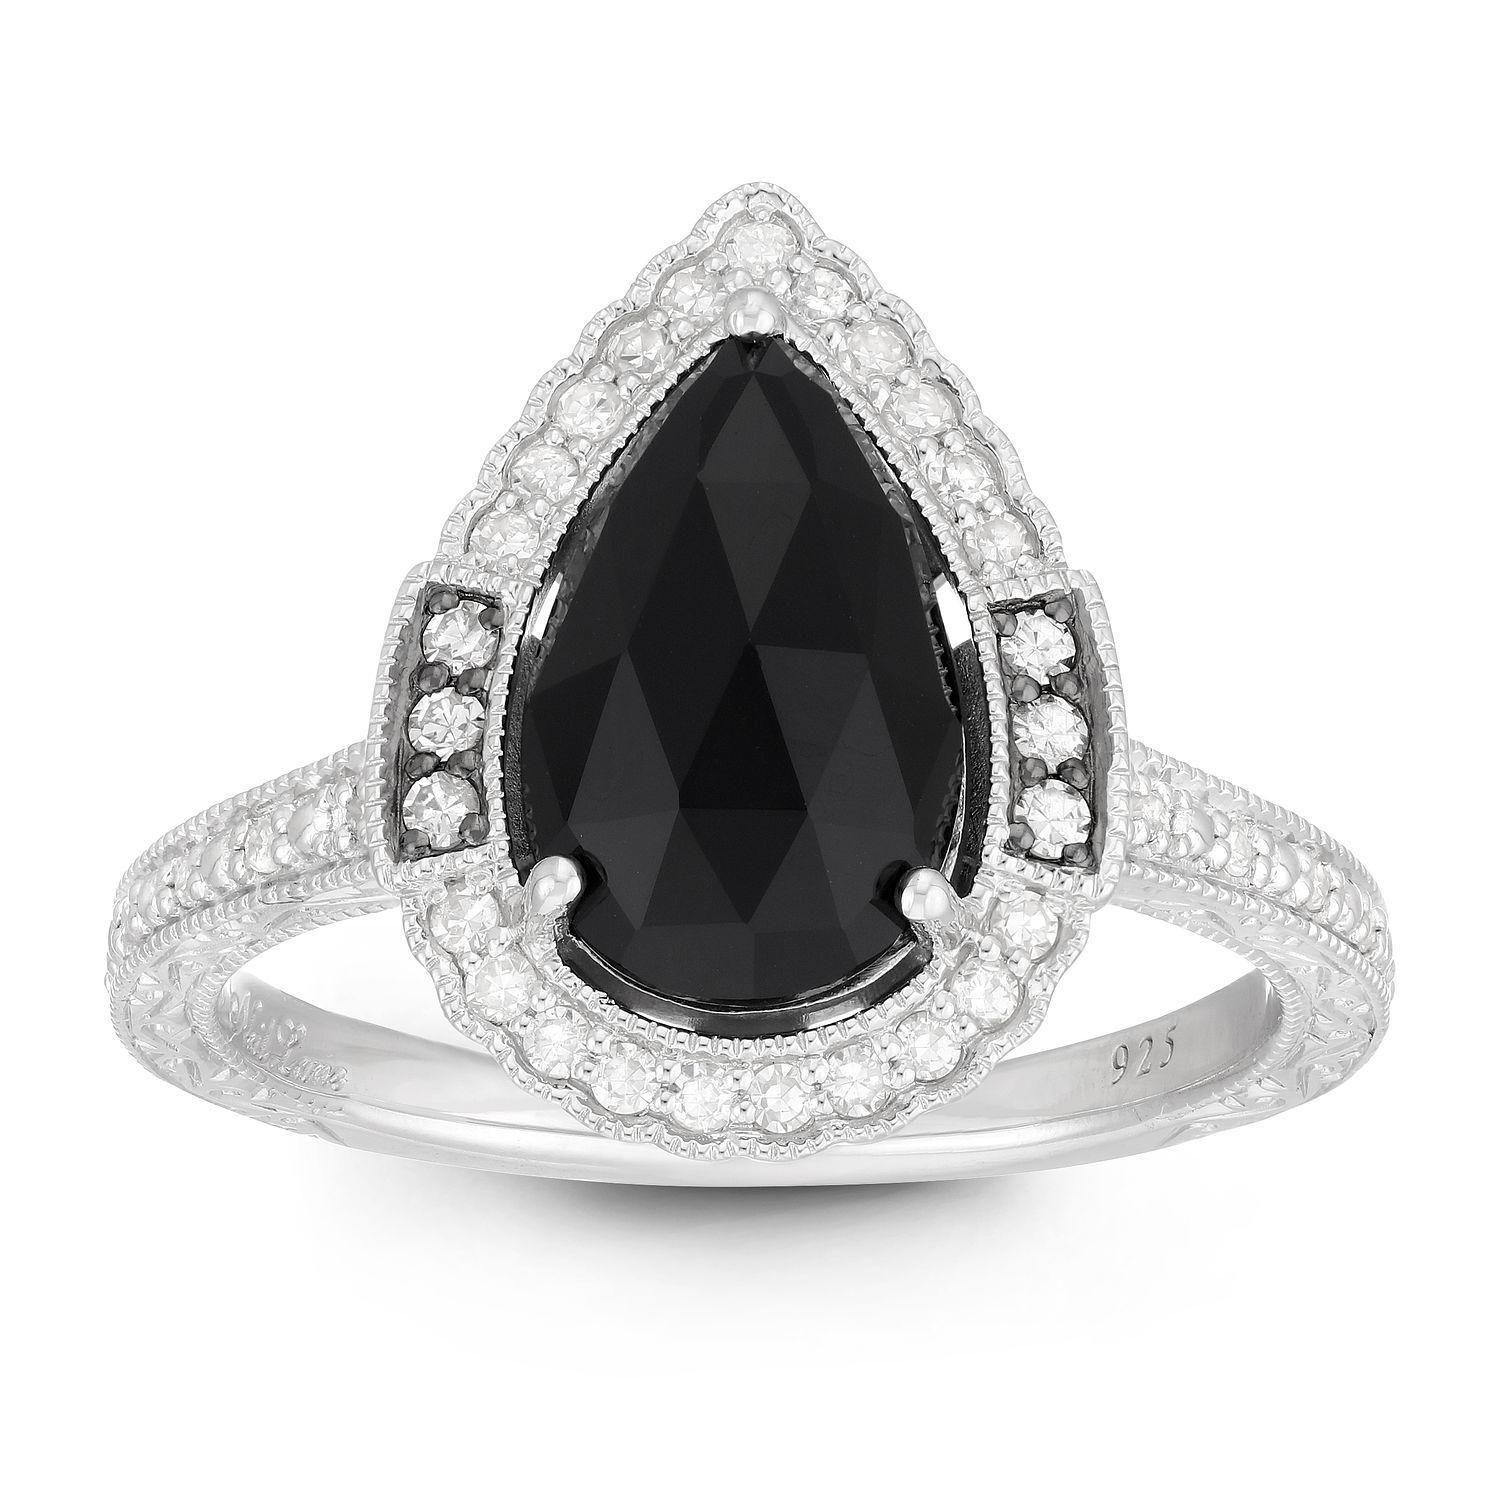 Neil Lane Designs Silver 1/5ct Diamond & Onyx Pear Ring